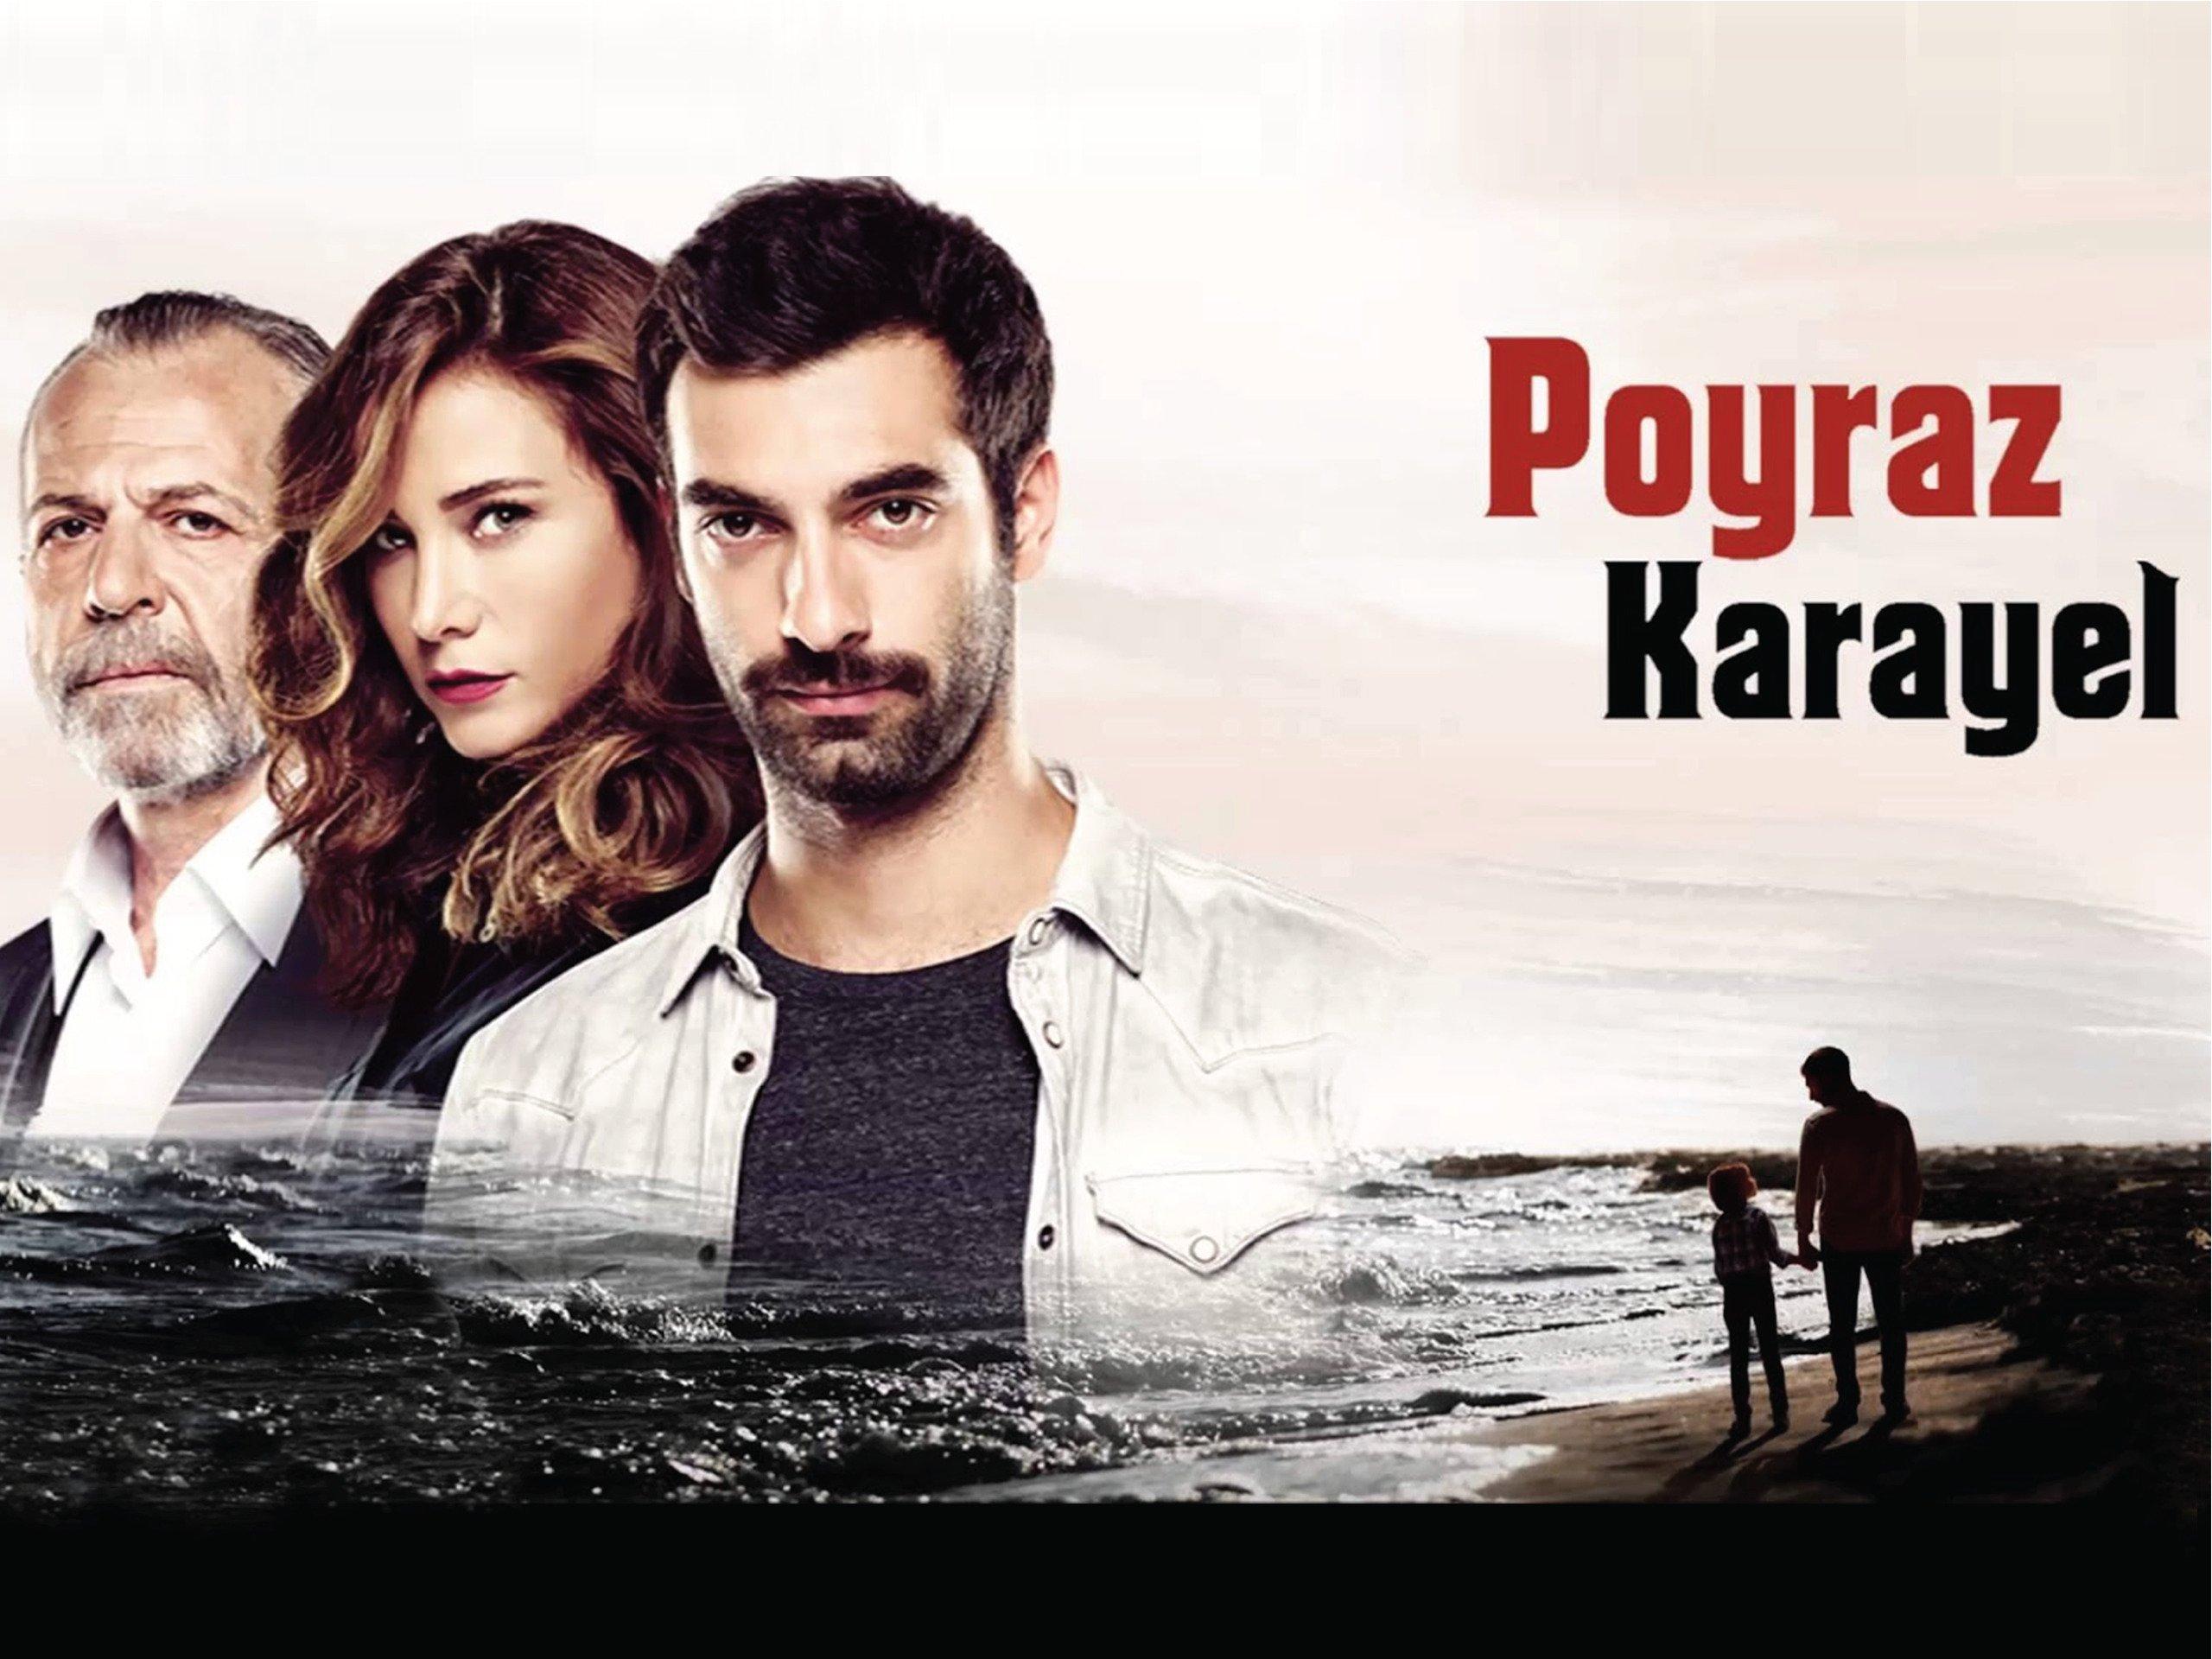 Poyraz Karayel turned upside down Turkish television when it was aired